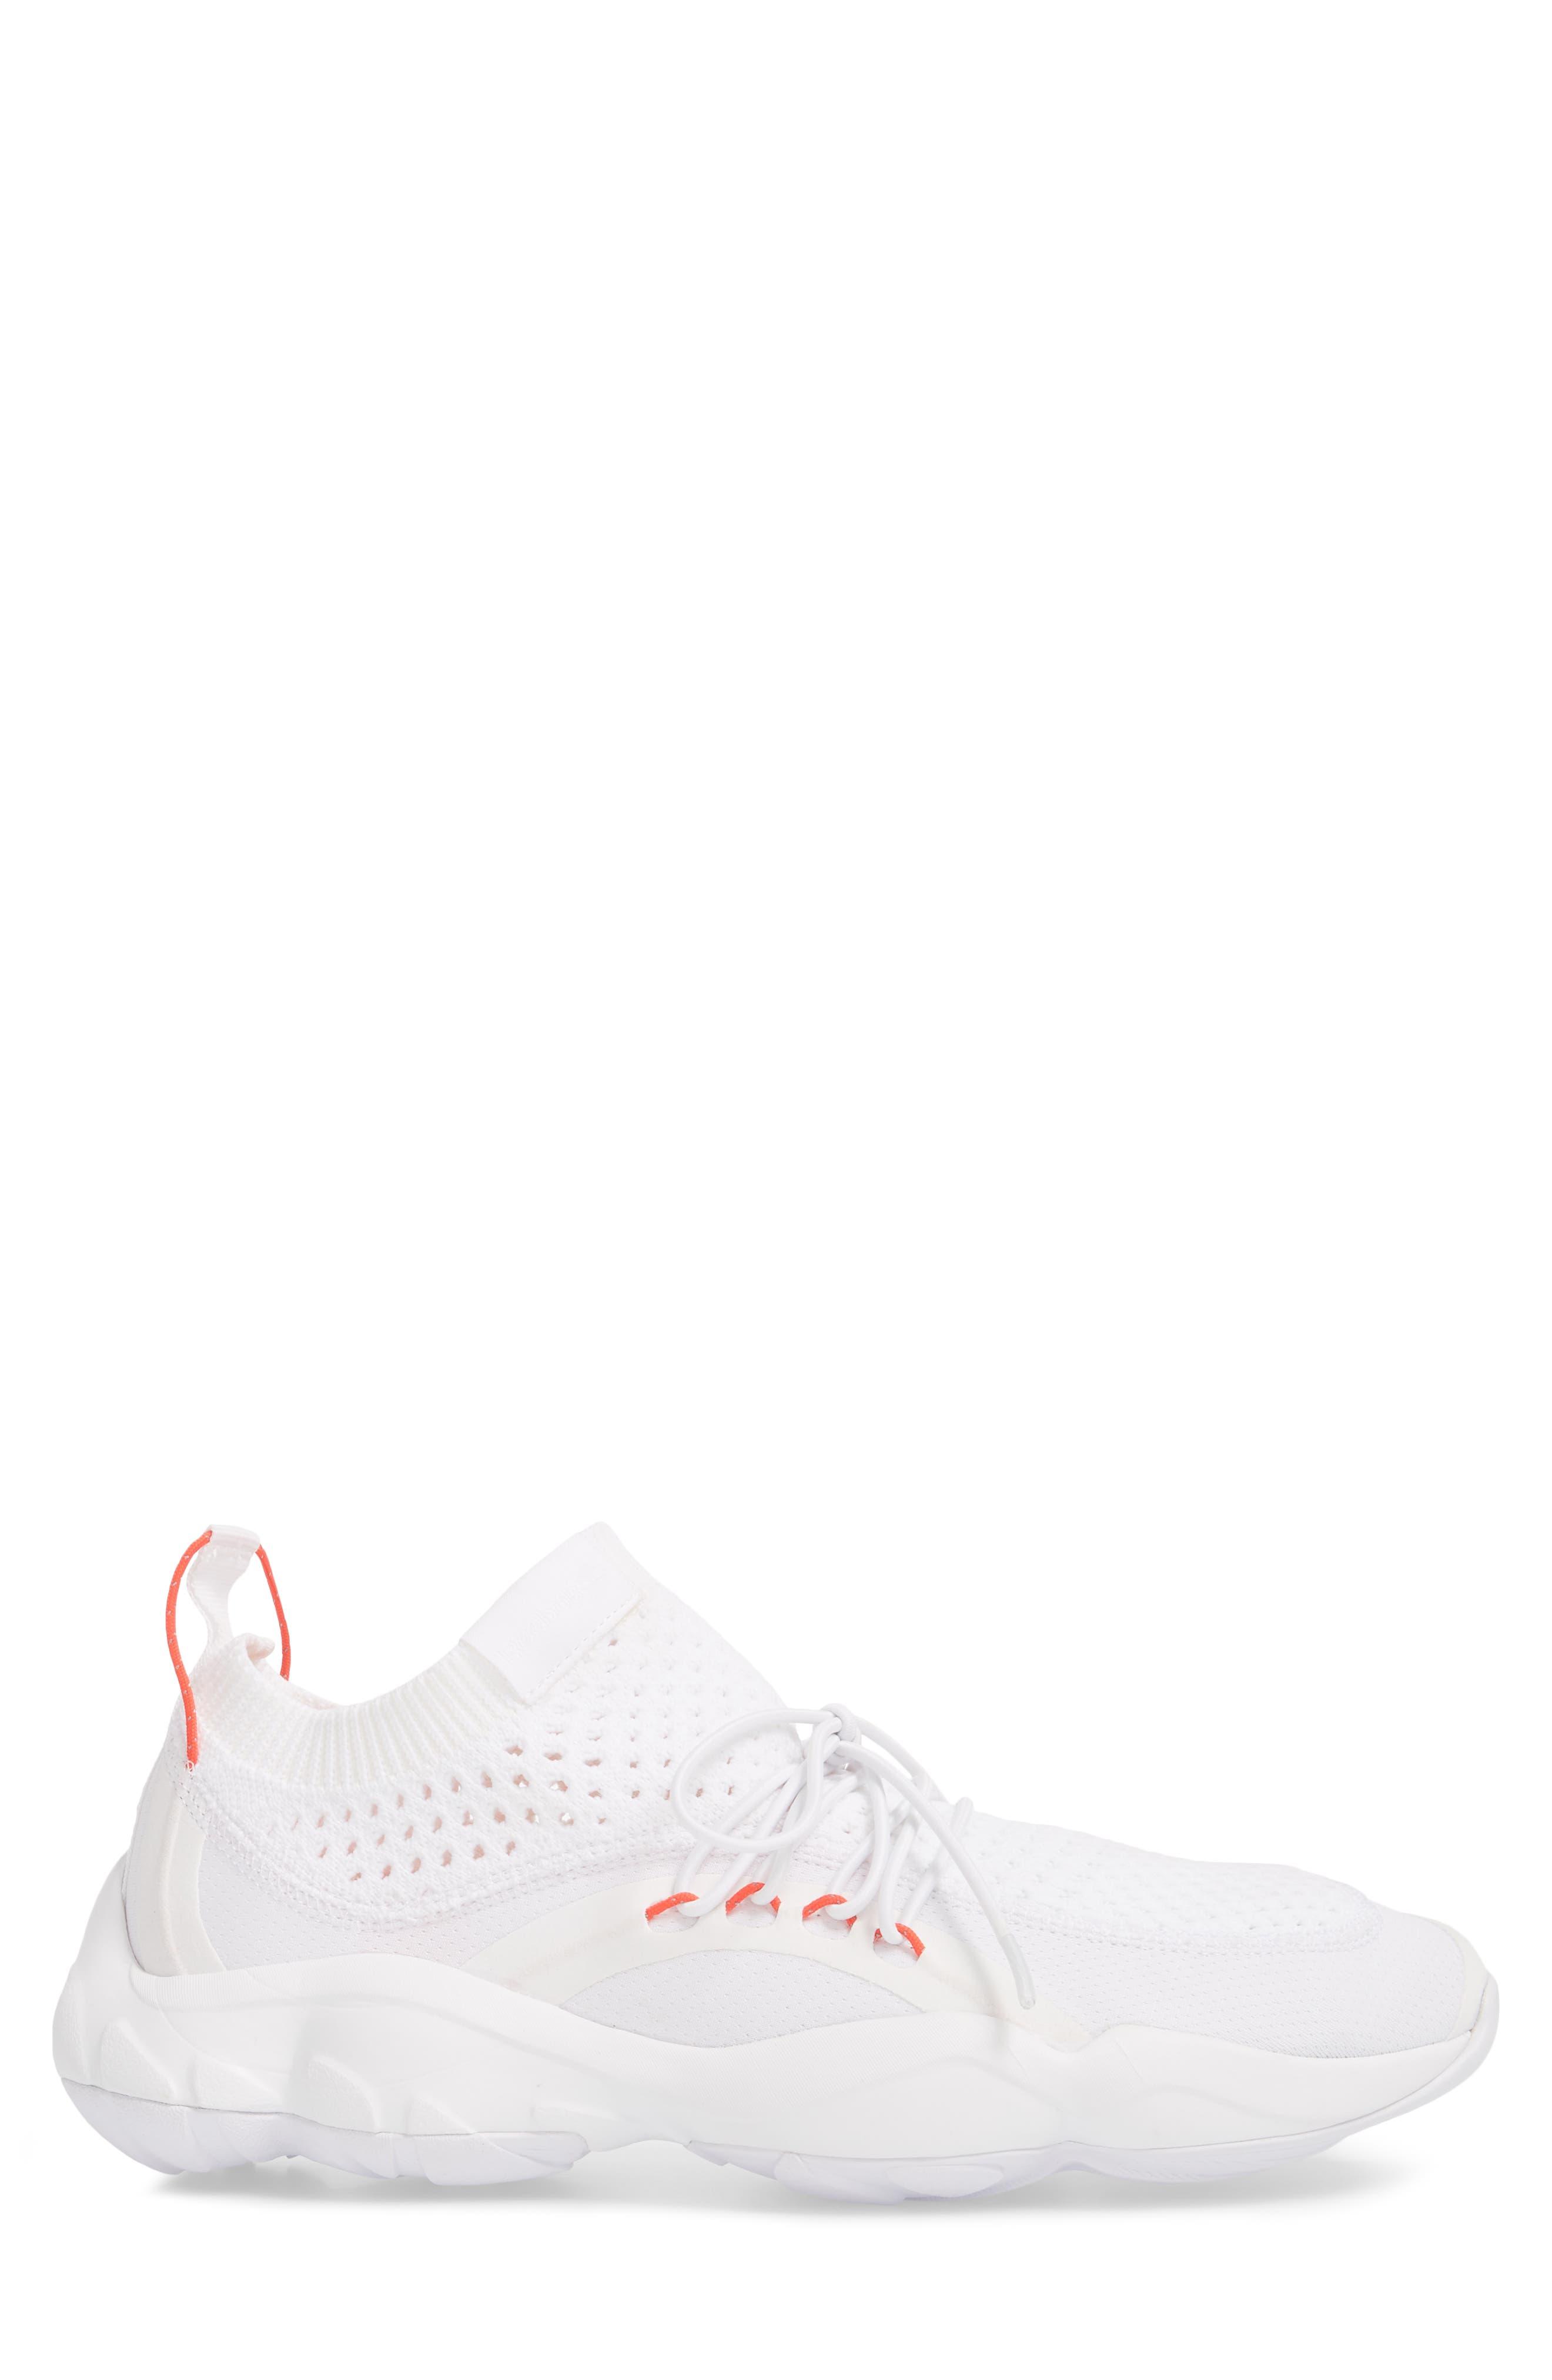 DMX Fusion NR Sneaker,                             Alternate thumbnail 3, color,                             WHITE/ BLACK/ NEON CHERRY